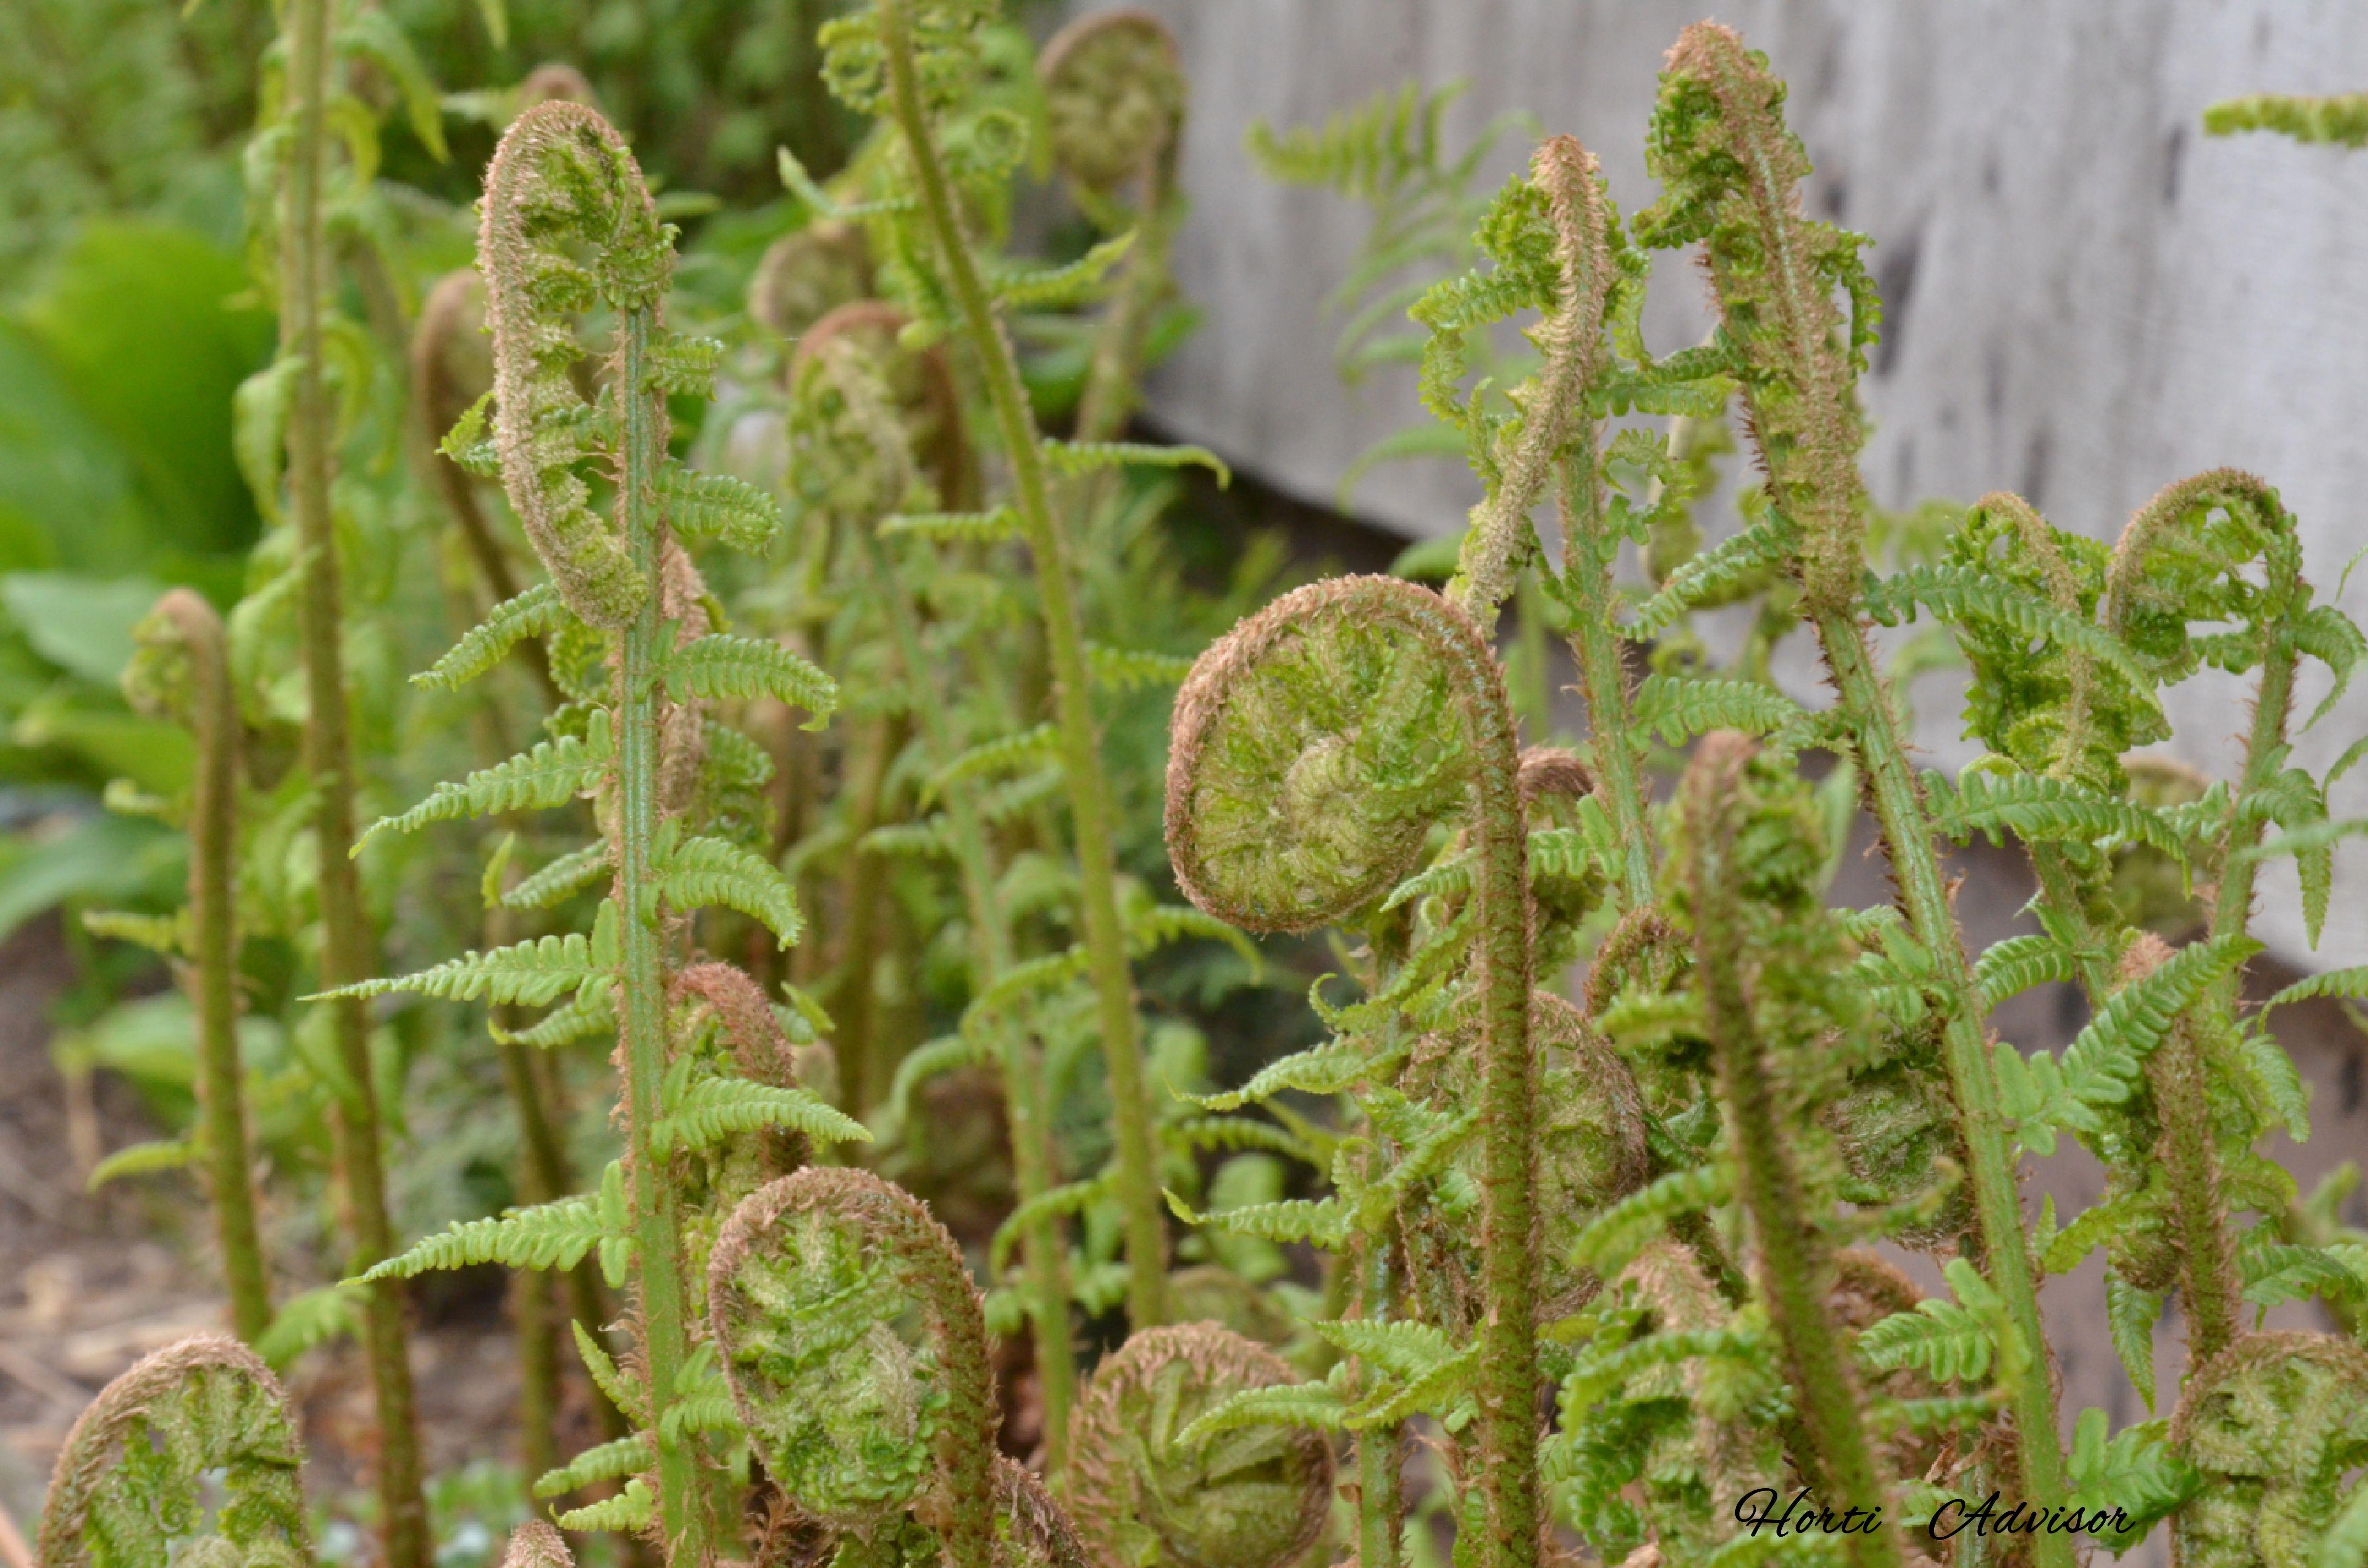 Matteuccia Struthiopteris L Todaro Fern Pioropusznik Strusi In 2020 Horticulture Floristry Herbs